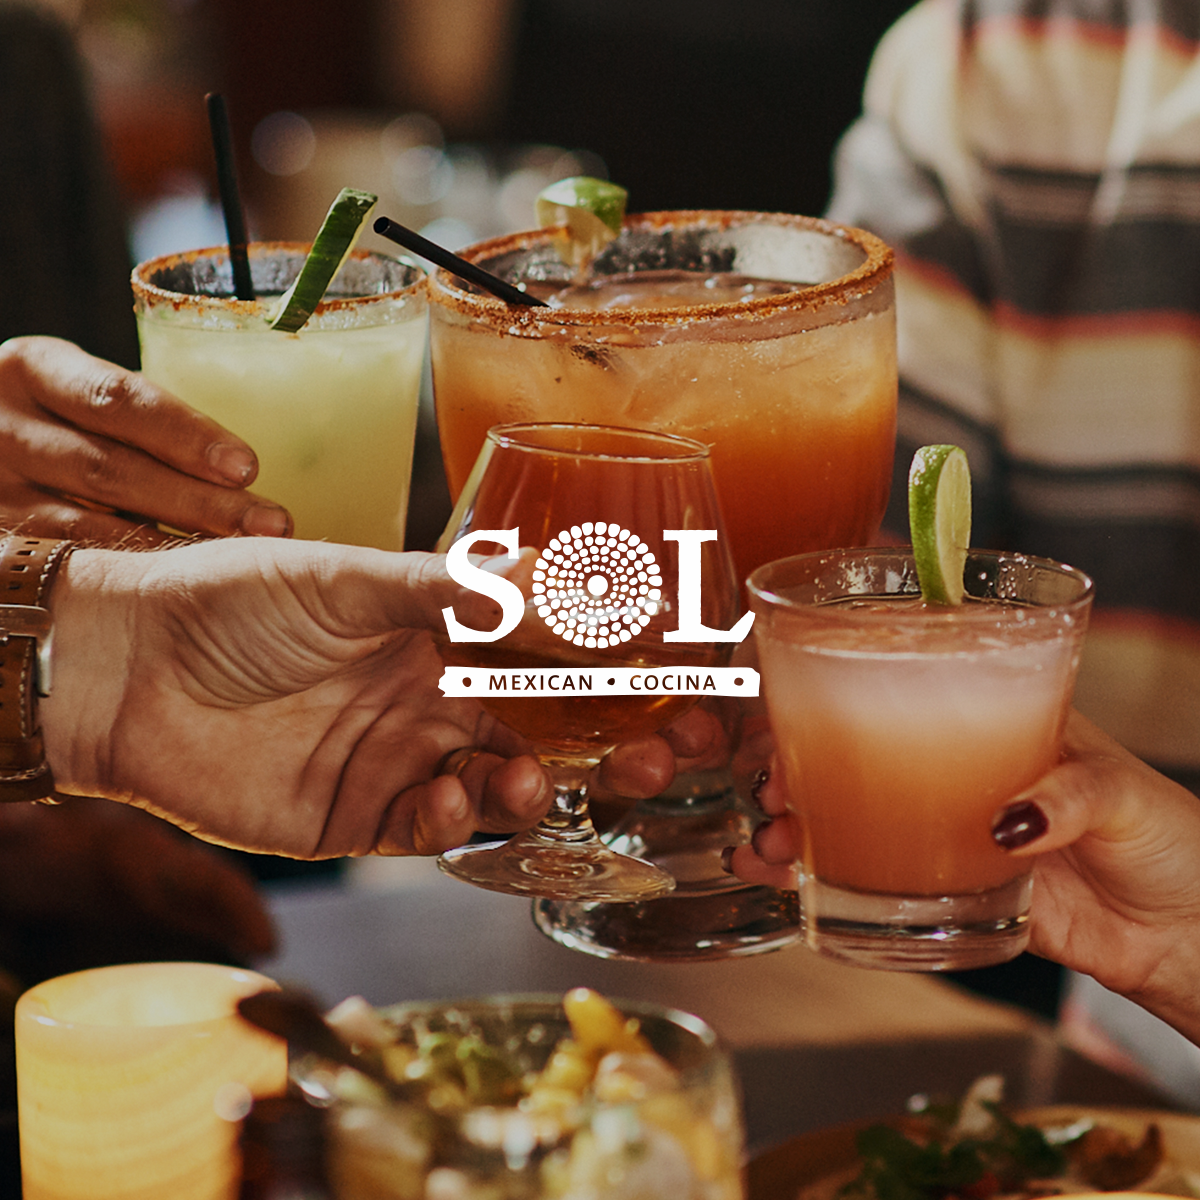 SOL Mexican Cocina – Share a Taste of Baja